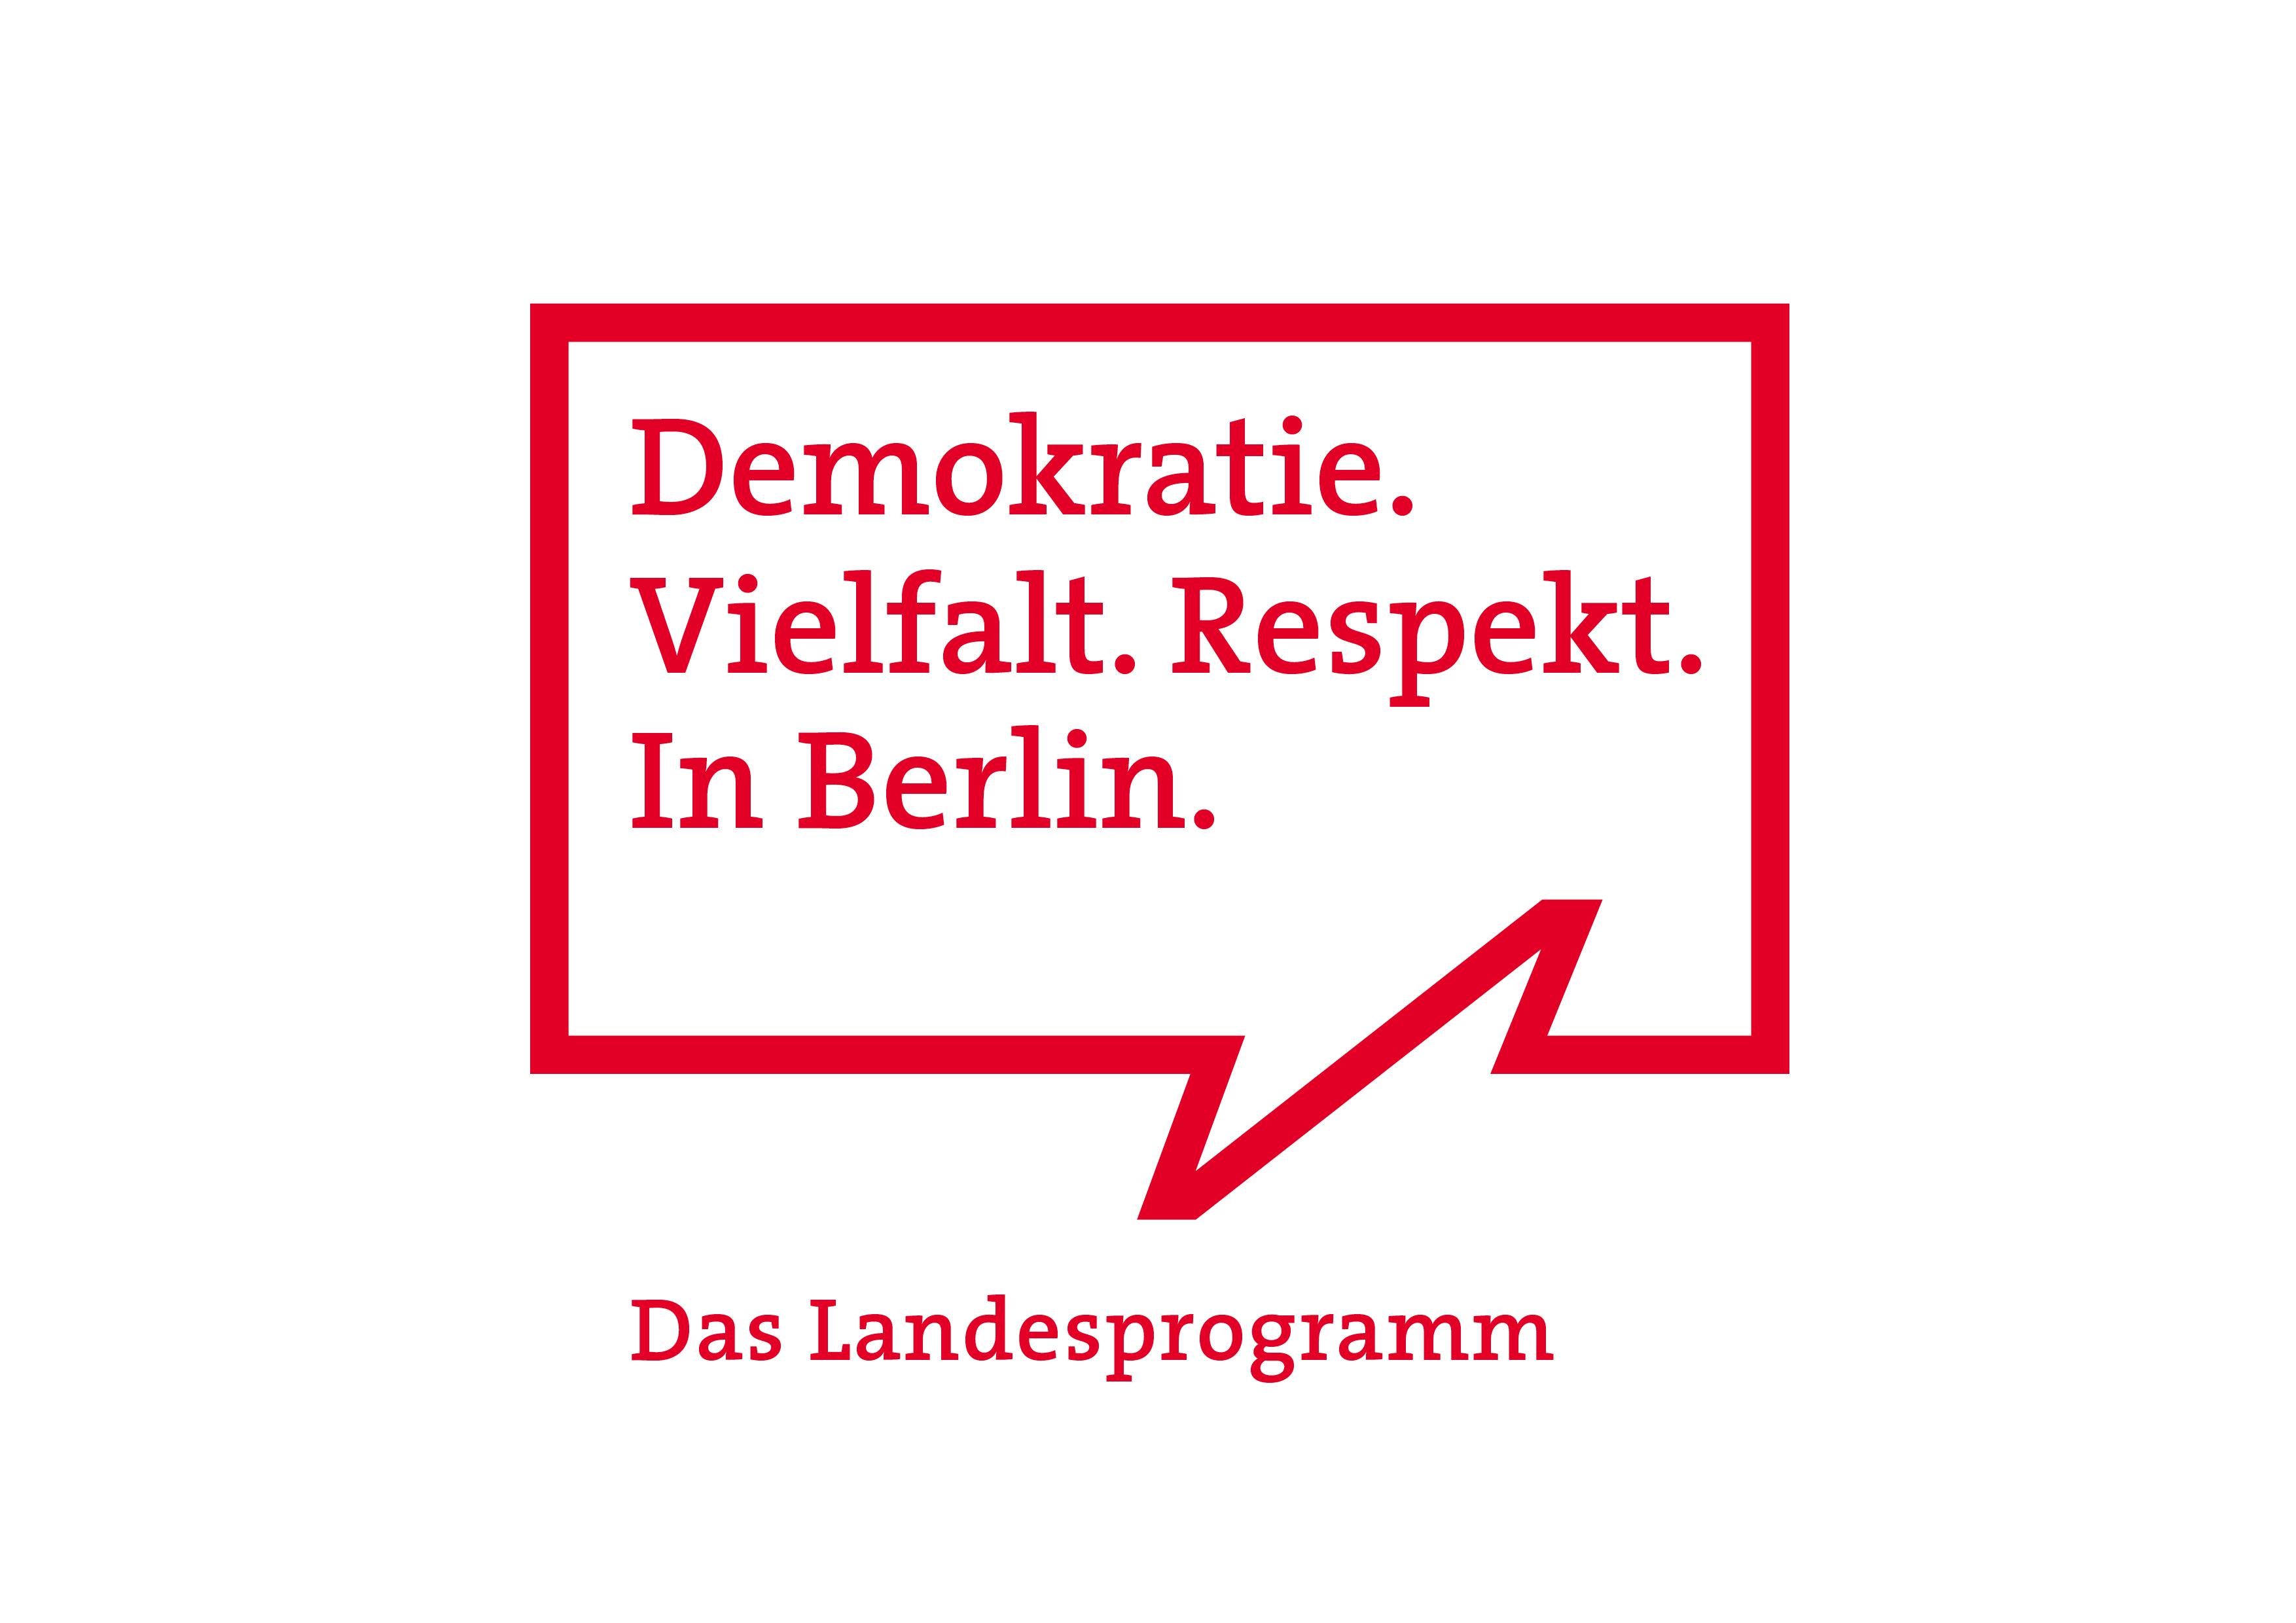 Logo Landesprogramm Demokratie Vielfalt Respekt in Berlin